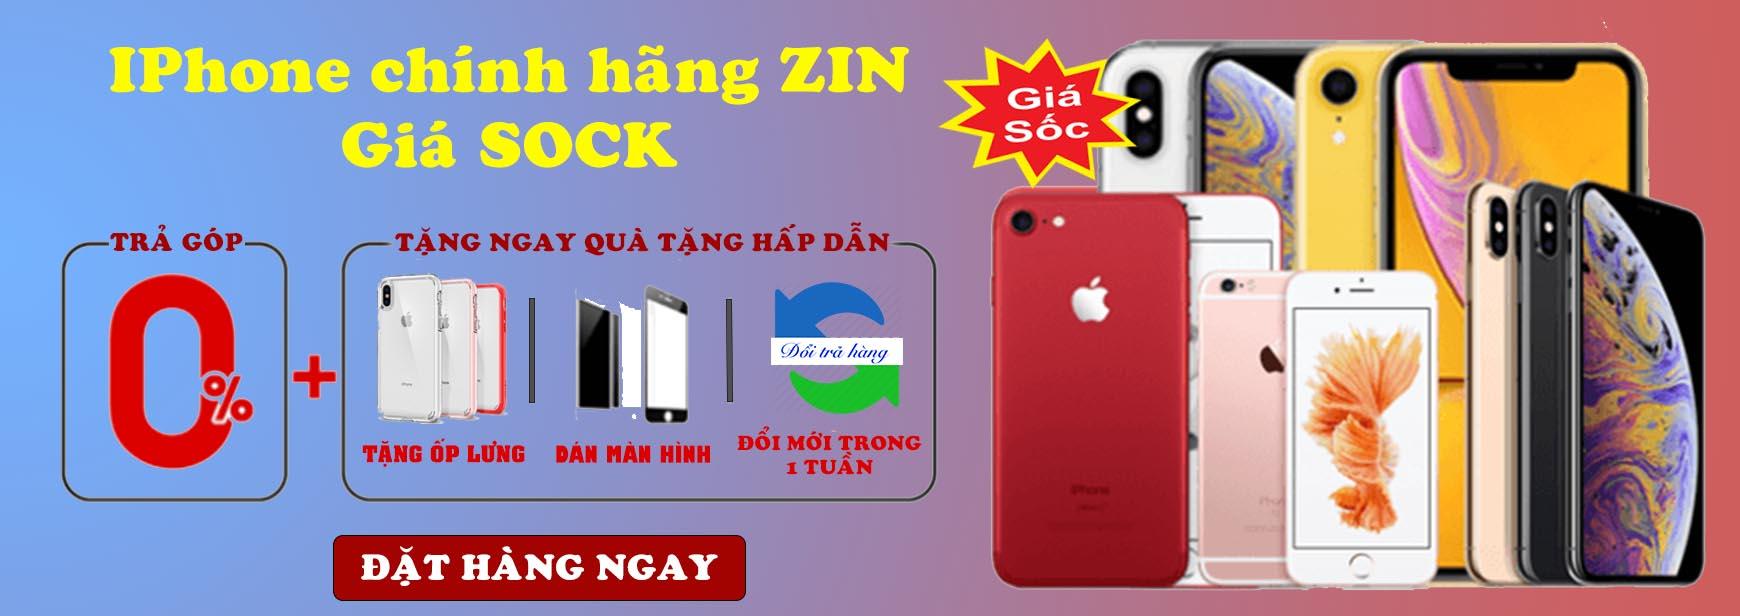 iPhone chính hãng Zin giá Sock